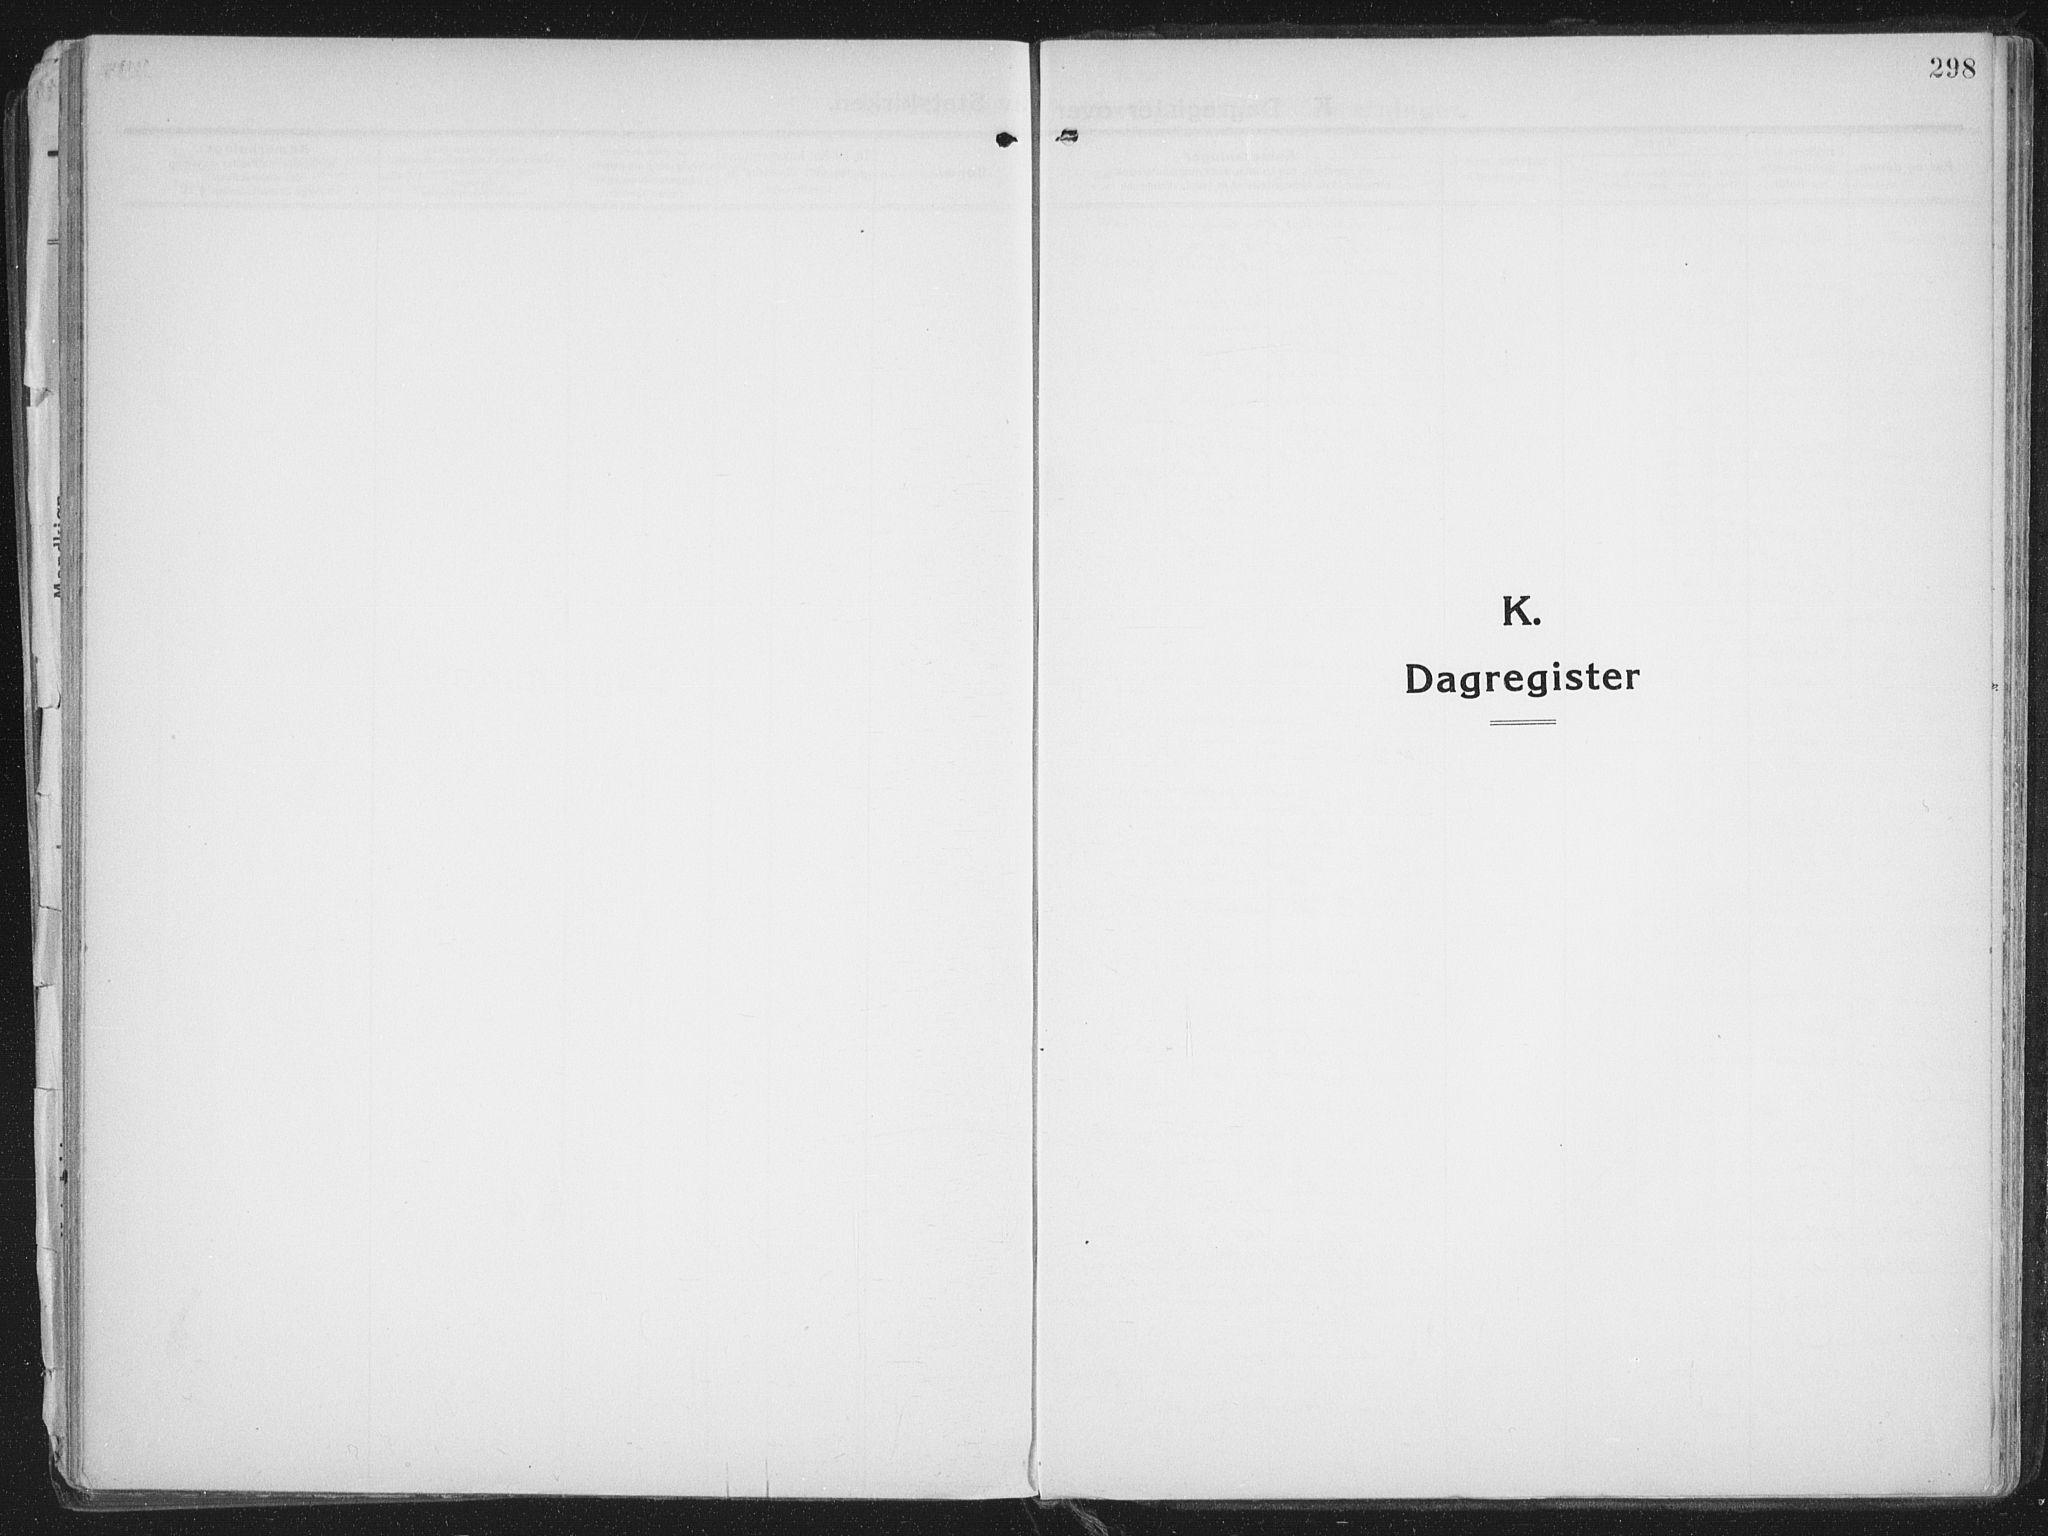 SATØ, Lenvik sokneprestembete, H/Ha: Ministerialbok nr. 16, 1910-1924, s. 298